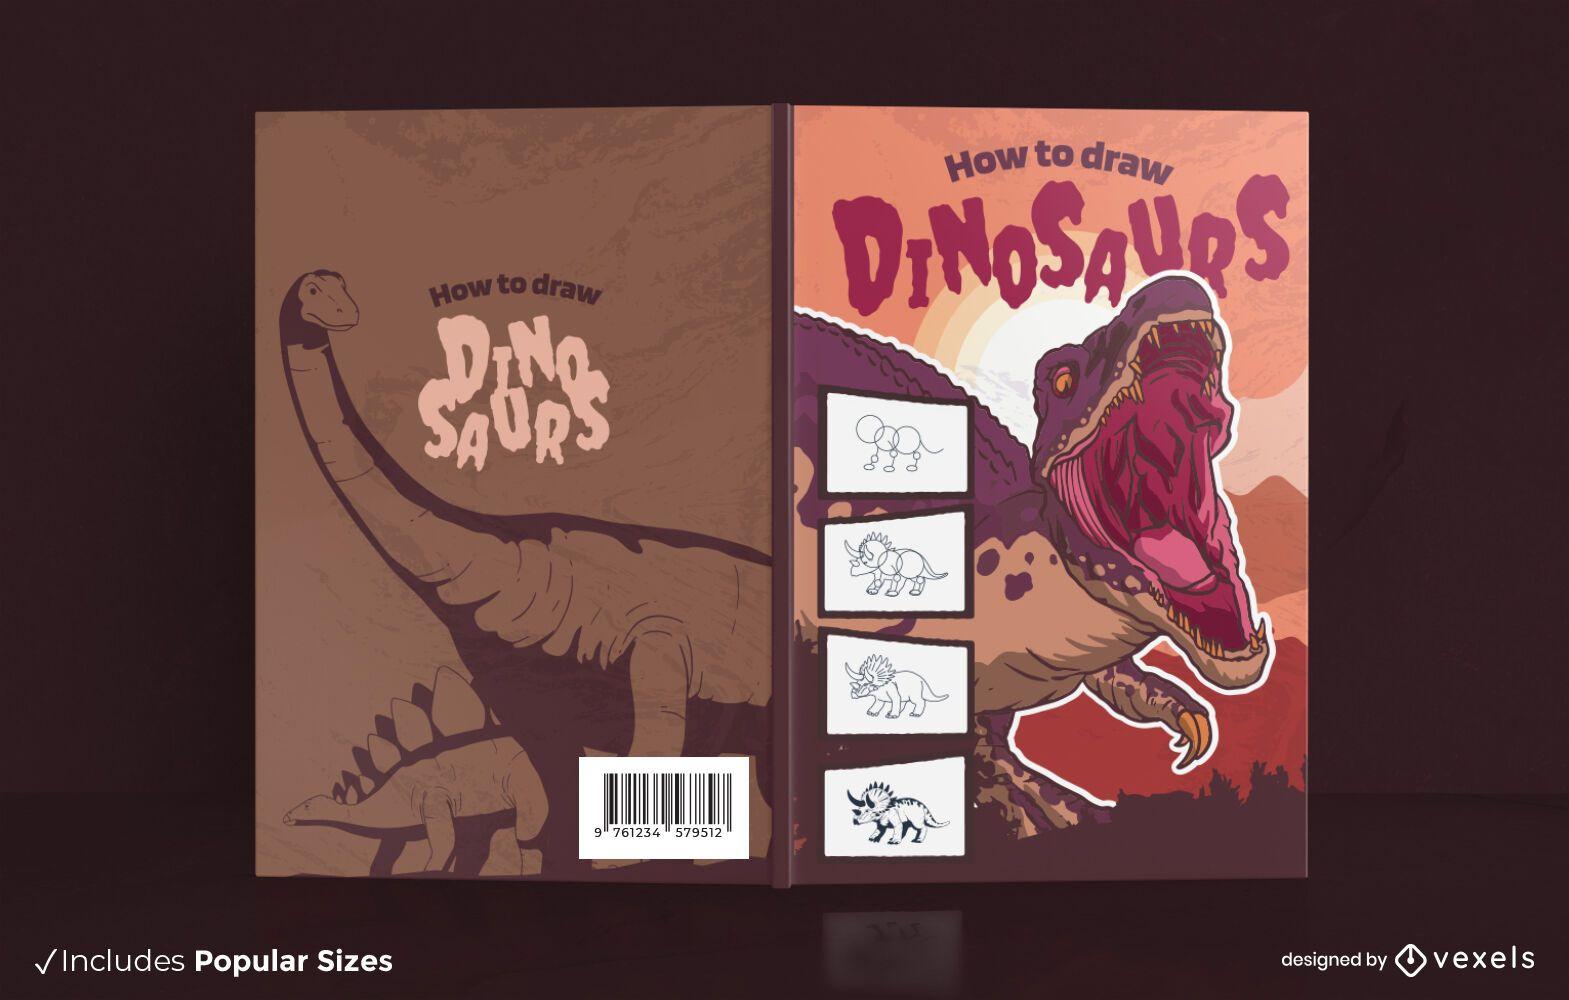 Diseño de portada de libro de dibujo de dinosaurio t-rex